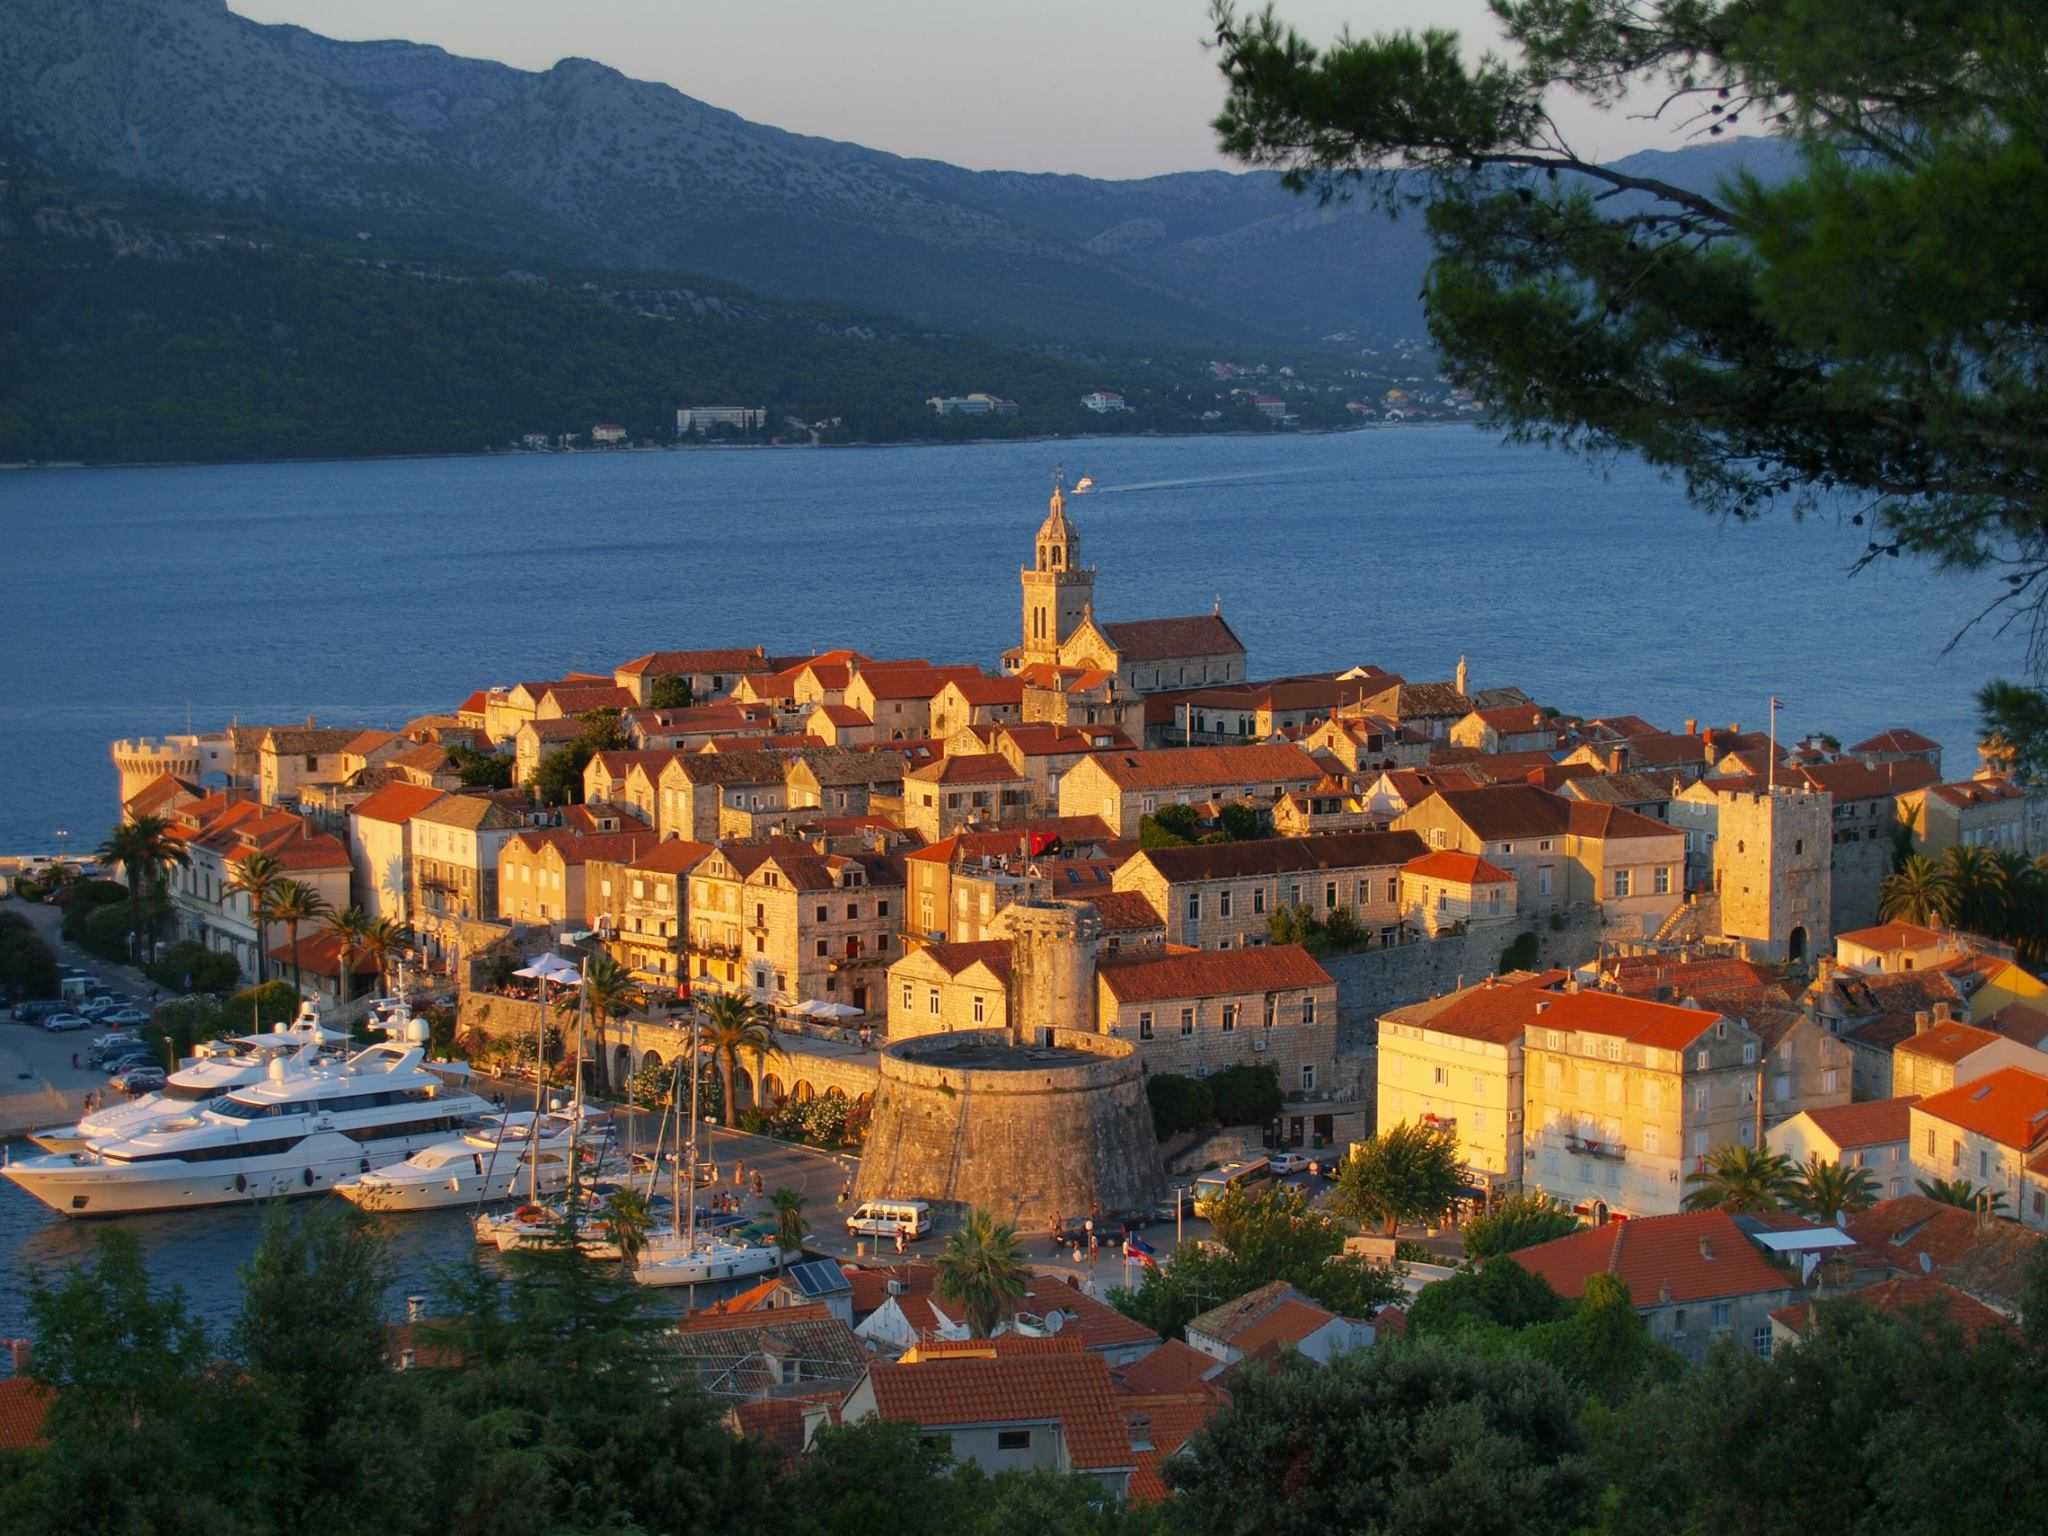 Korčula (Korcula), Croatia - Monterrasol small group tours to Korčula (Korcula), Croatia. Travel agency offers small group car tours to see Korčula (Korcula) in Croatia. Order small group tour to Korčula (Korcula) with departure date on request.